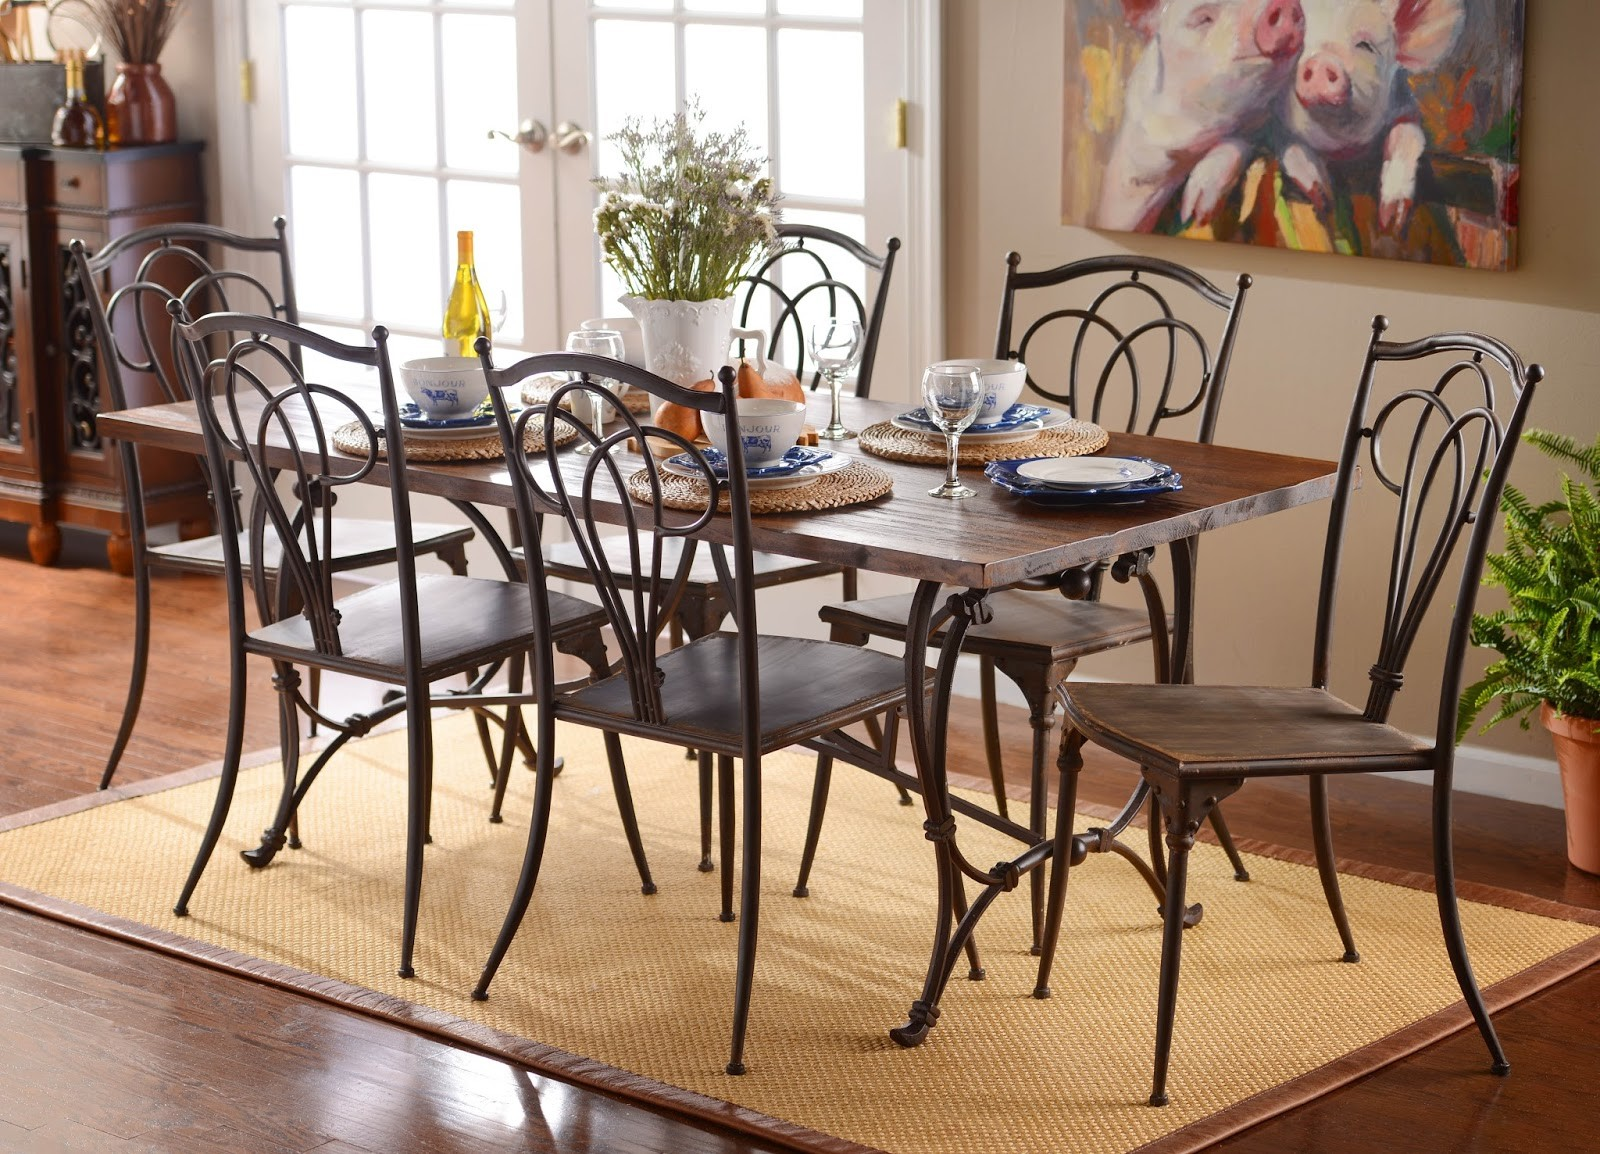 2 Furniture ideas Kirkland home decor by Simphome 2